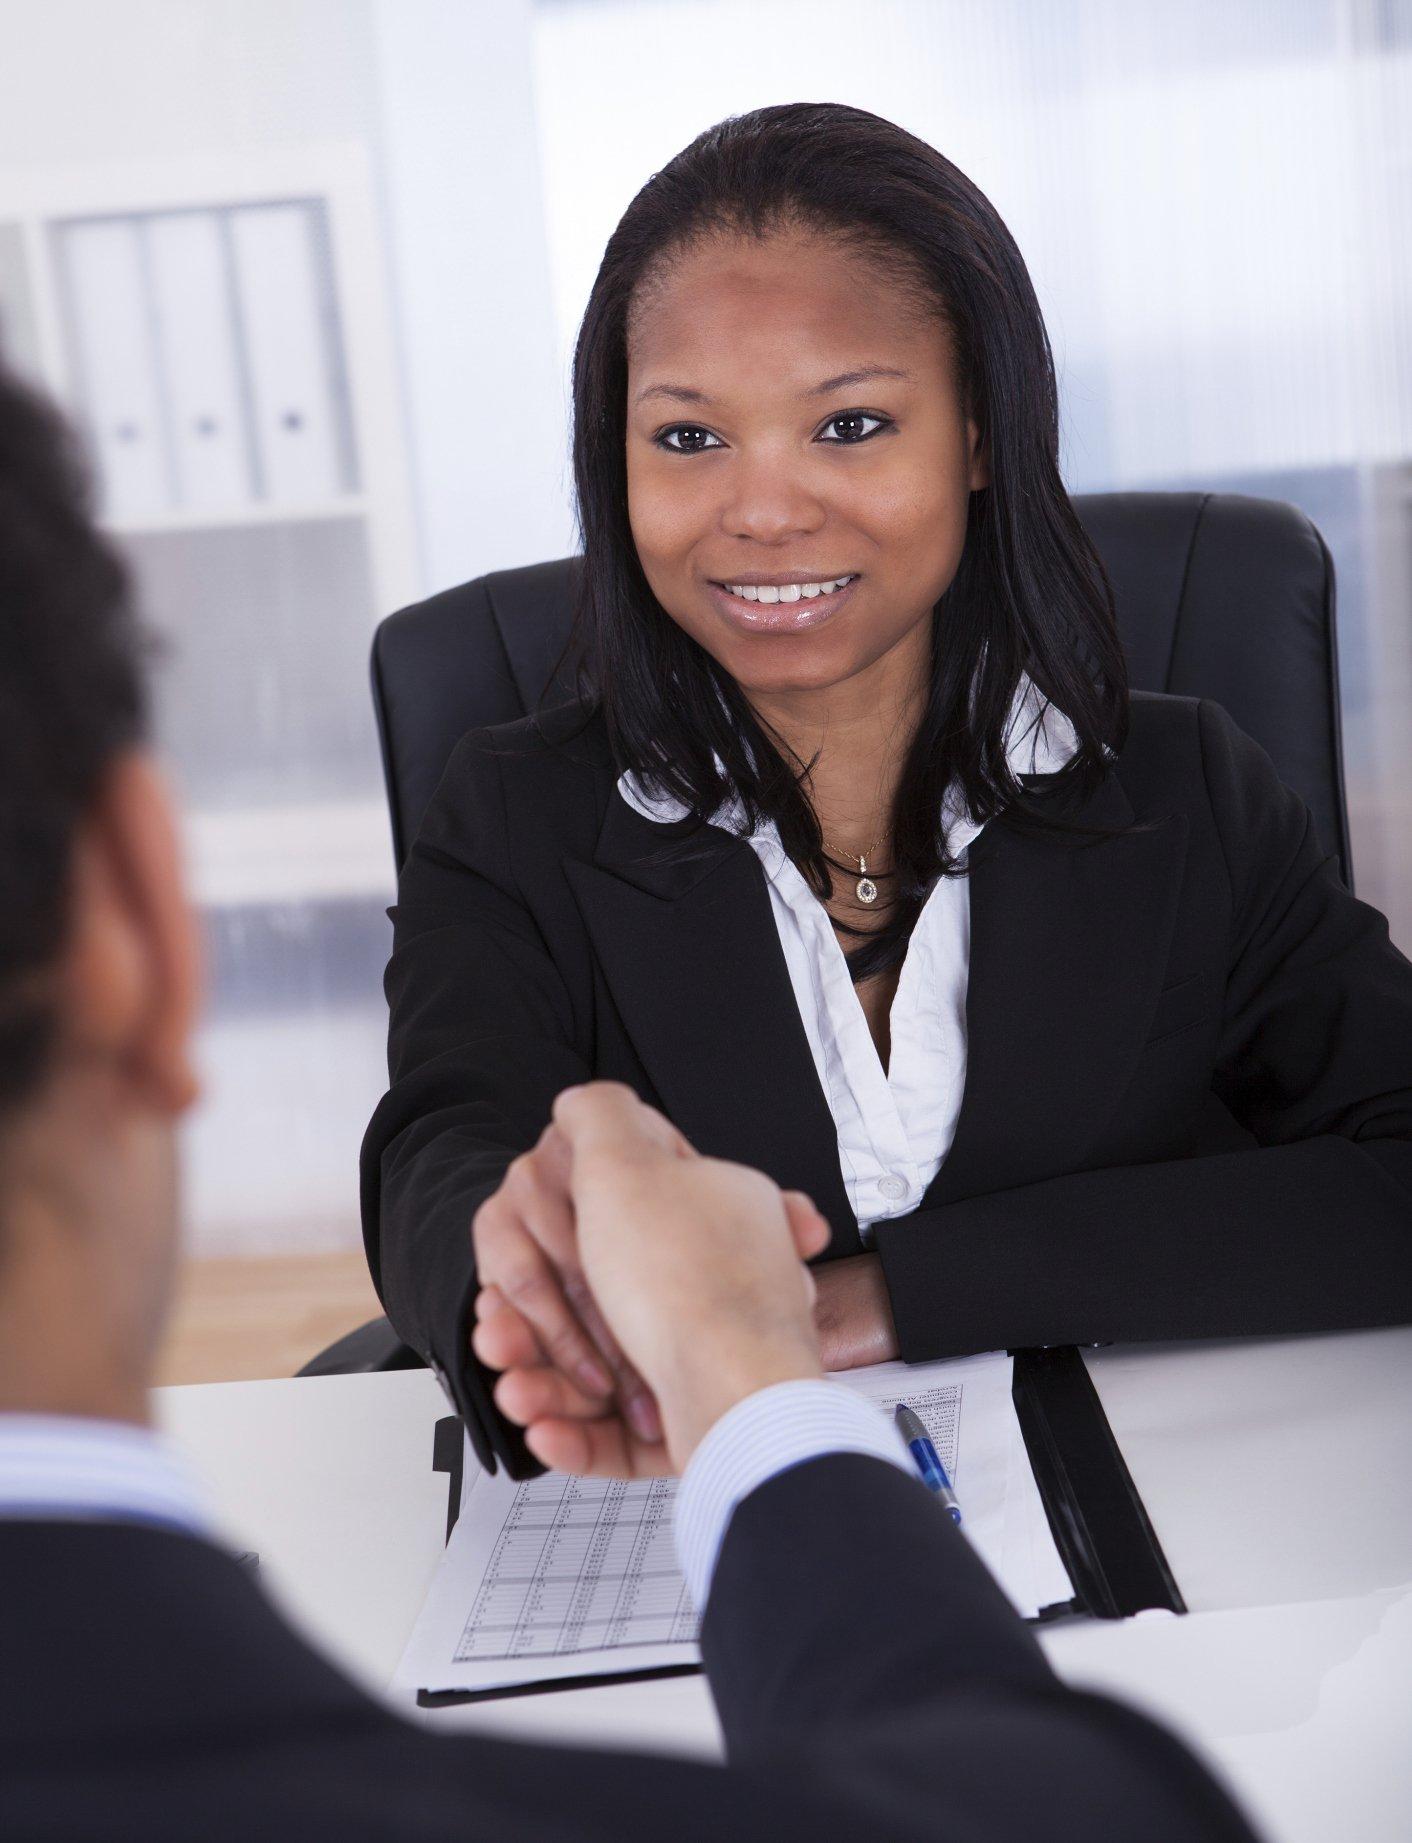 Employee Hired Meeting, Recruiting Agency in Buffalo NY